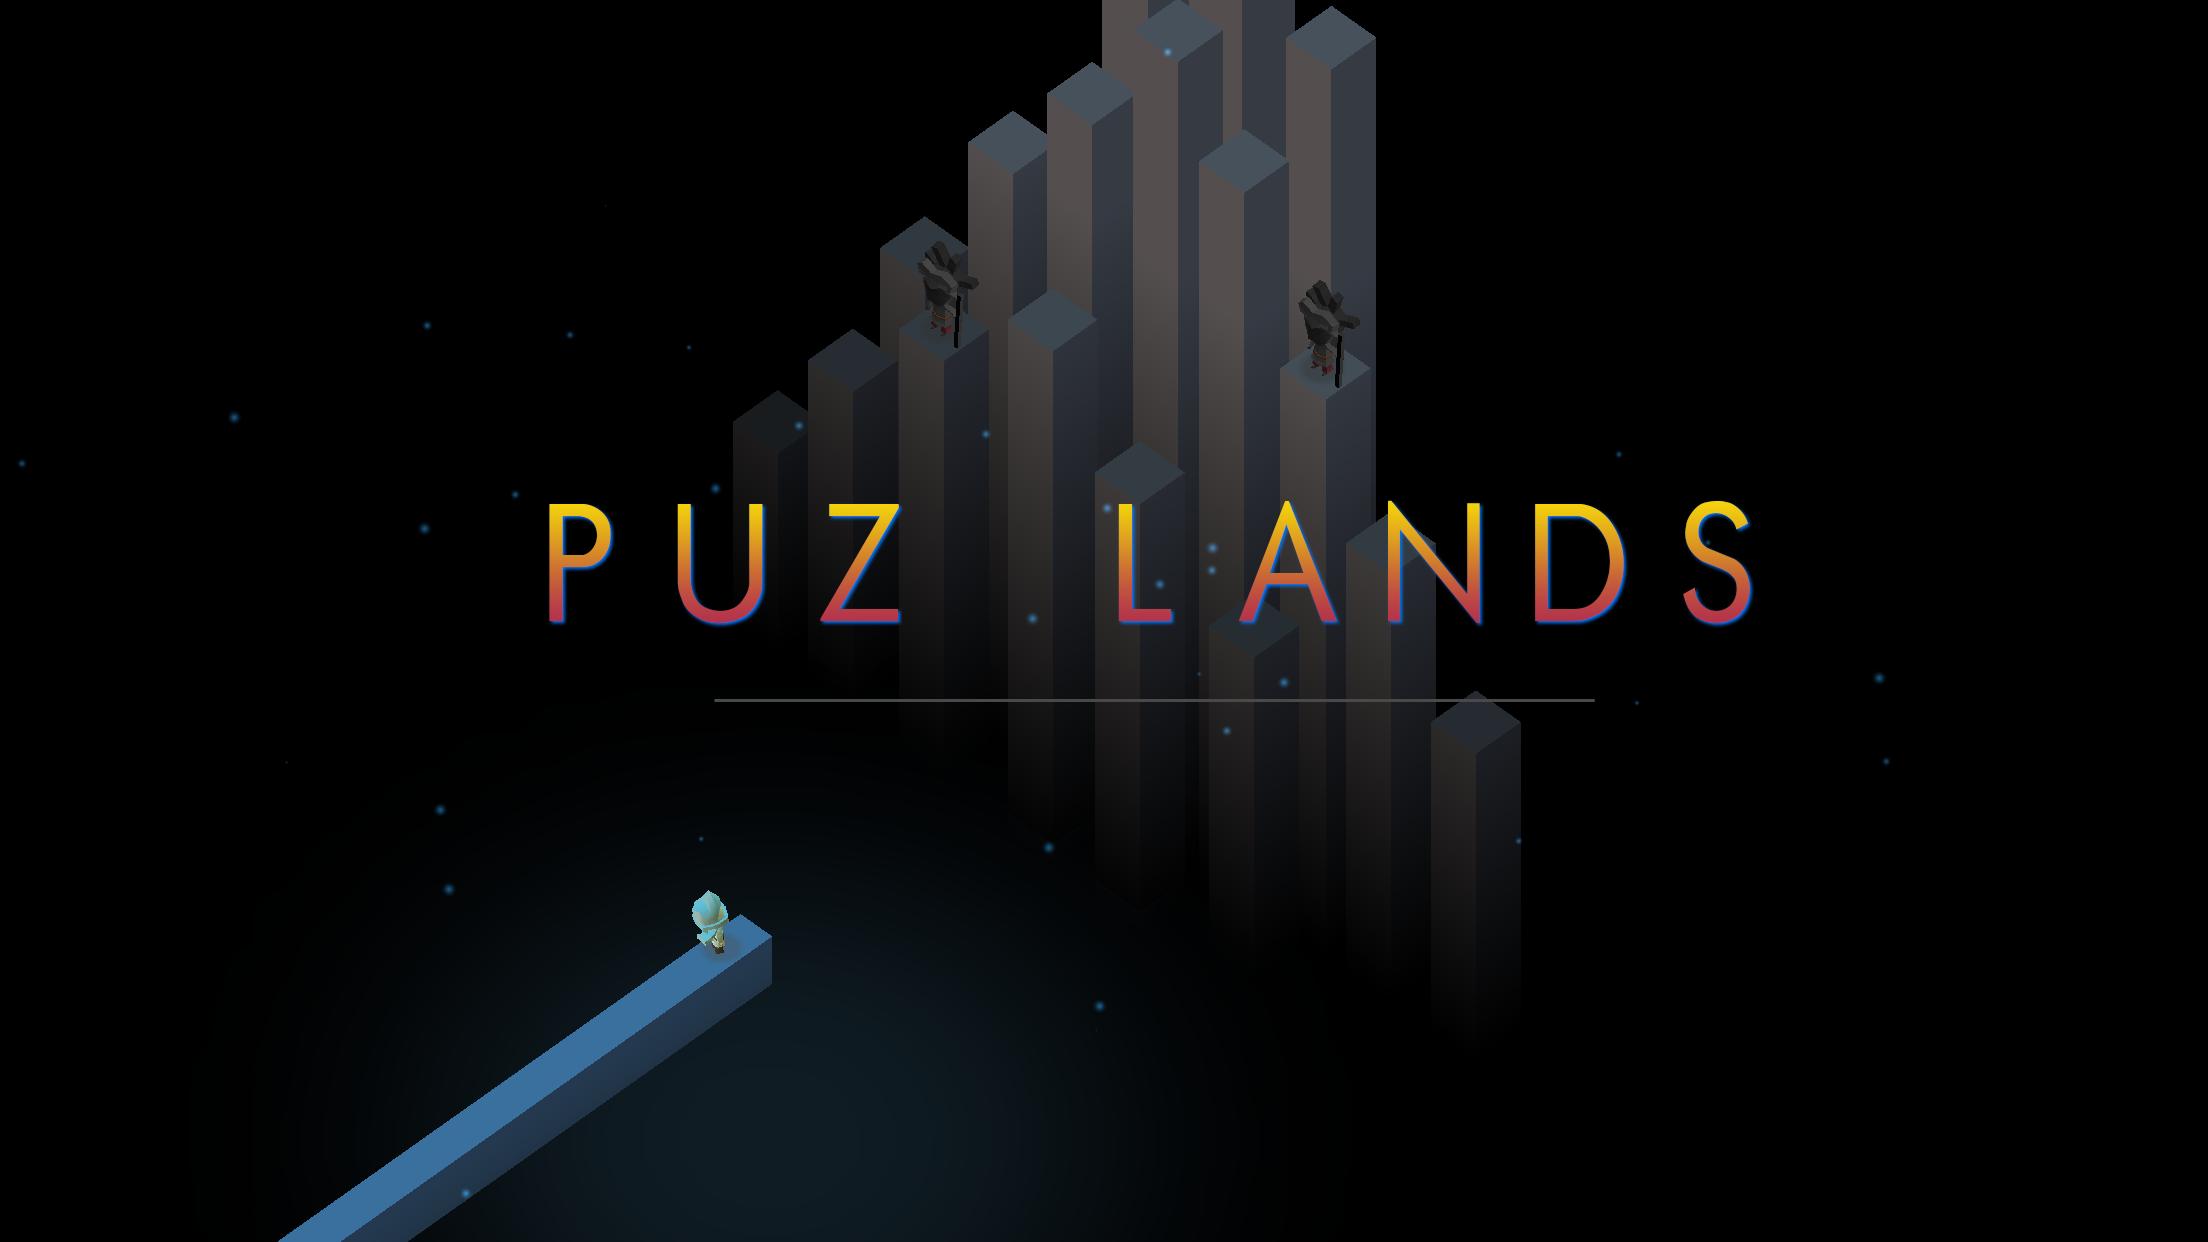 Puz Lands